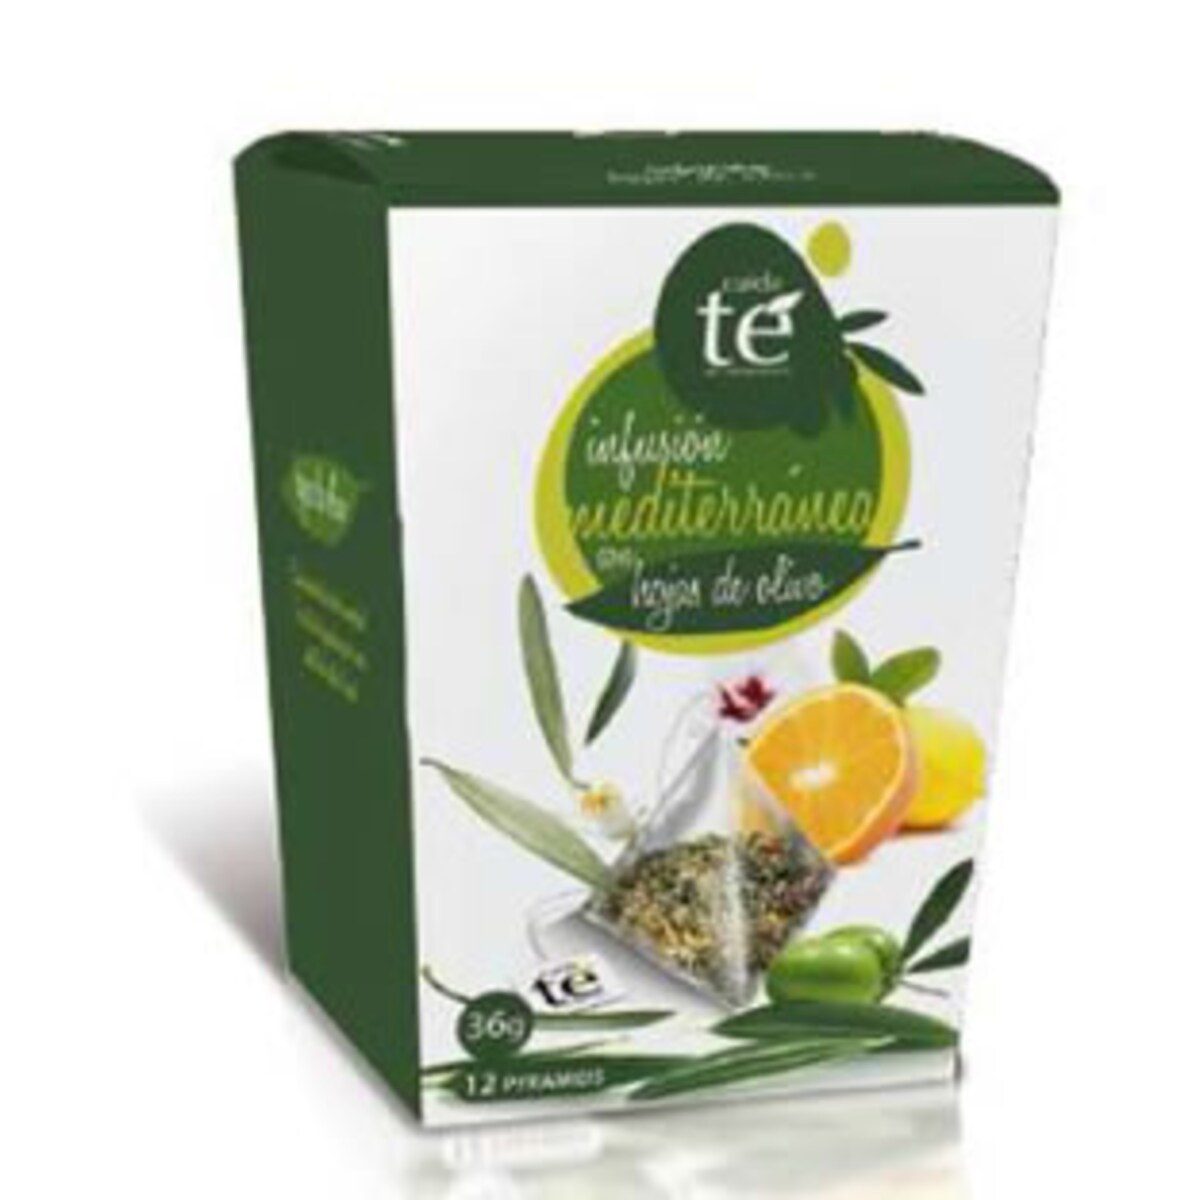 Cuida Te Infusion Mediterranea с маслинени листа